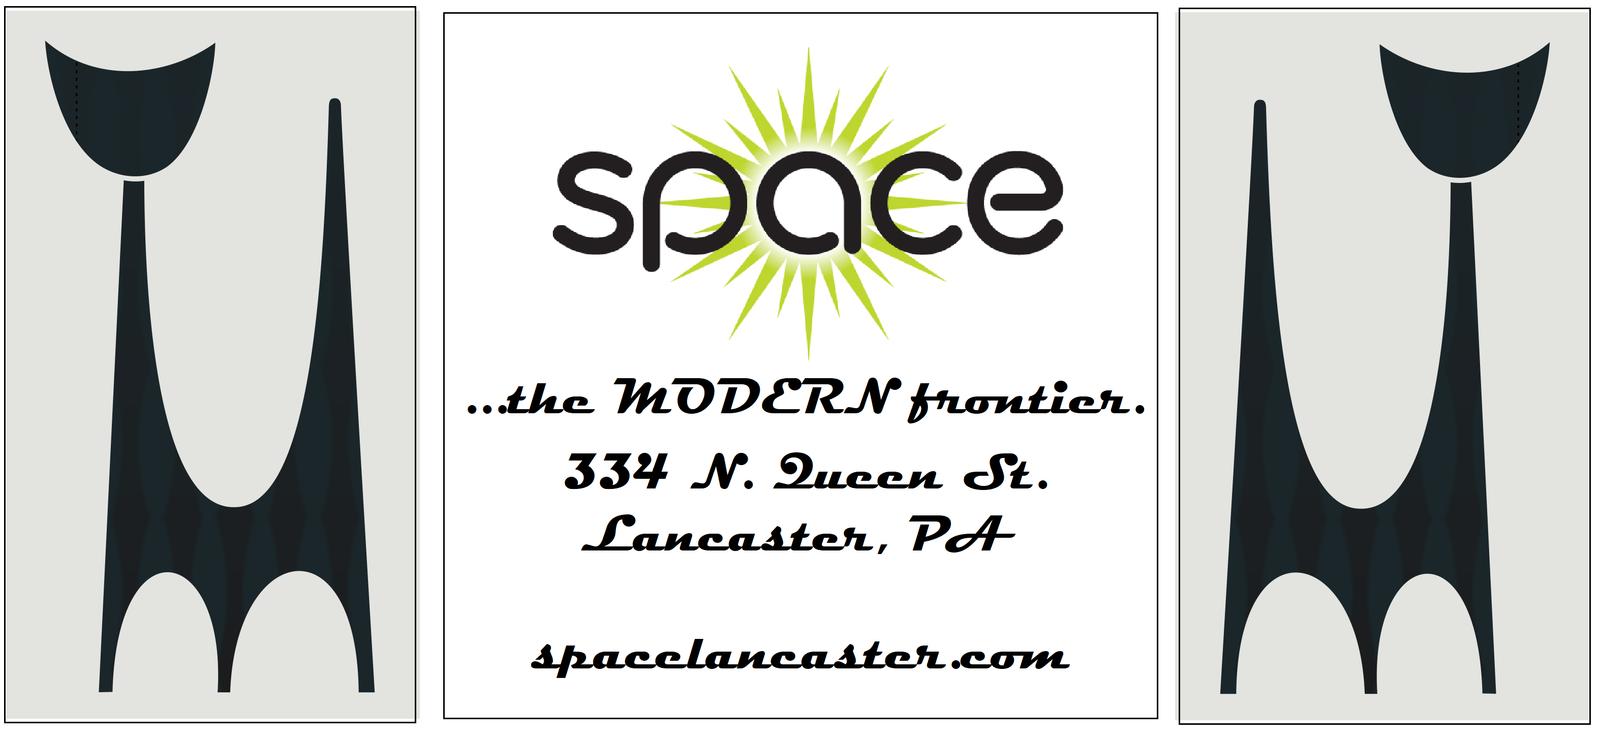 spacelancaster